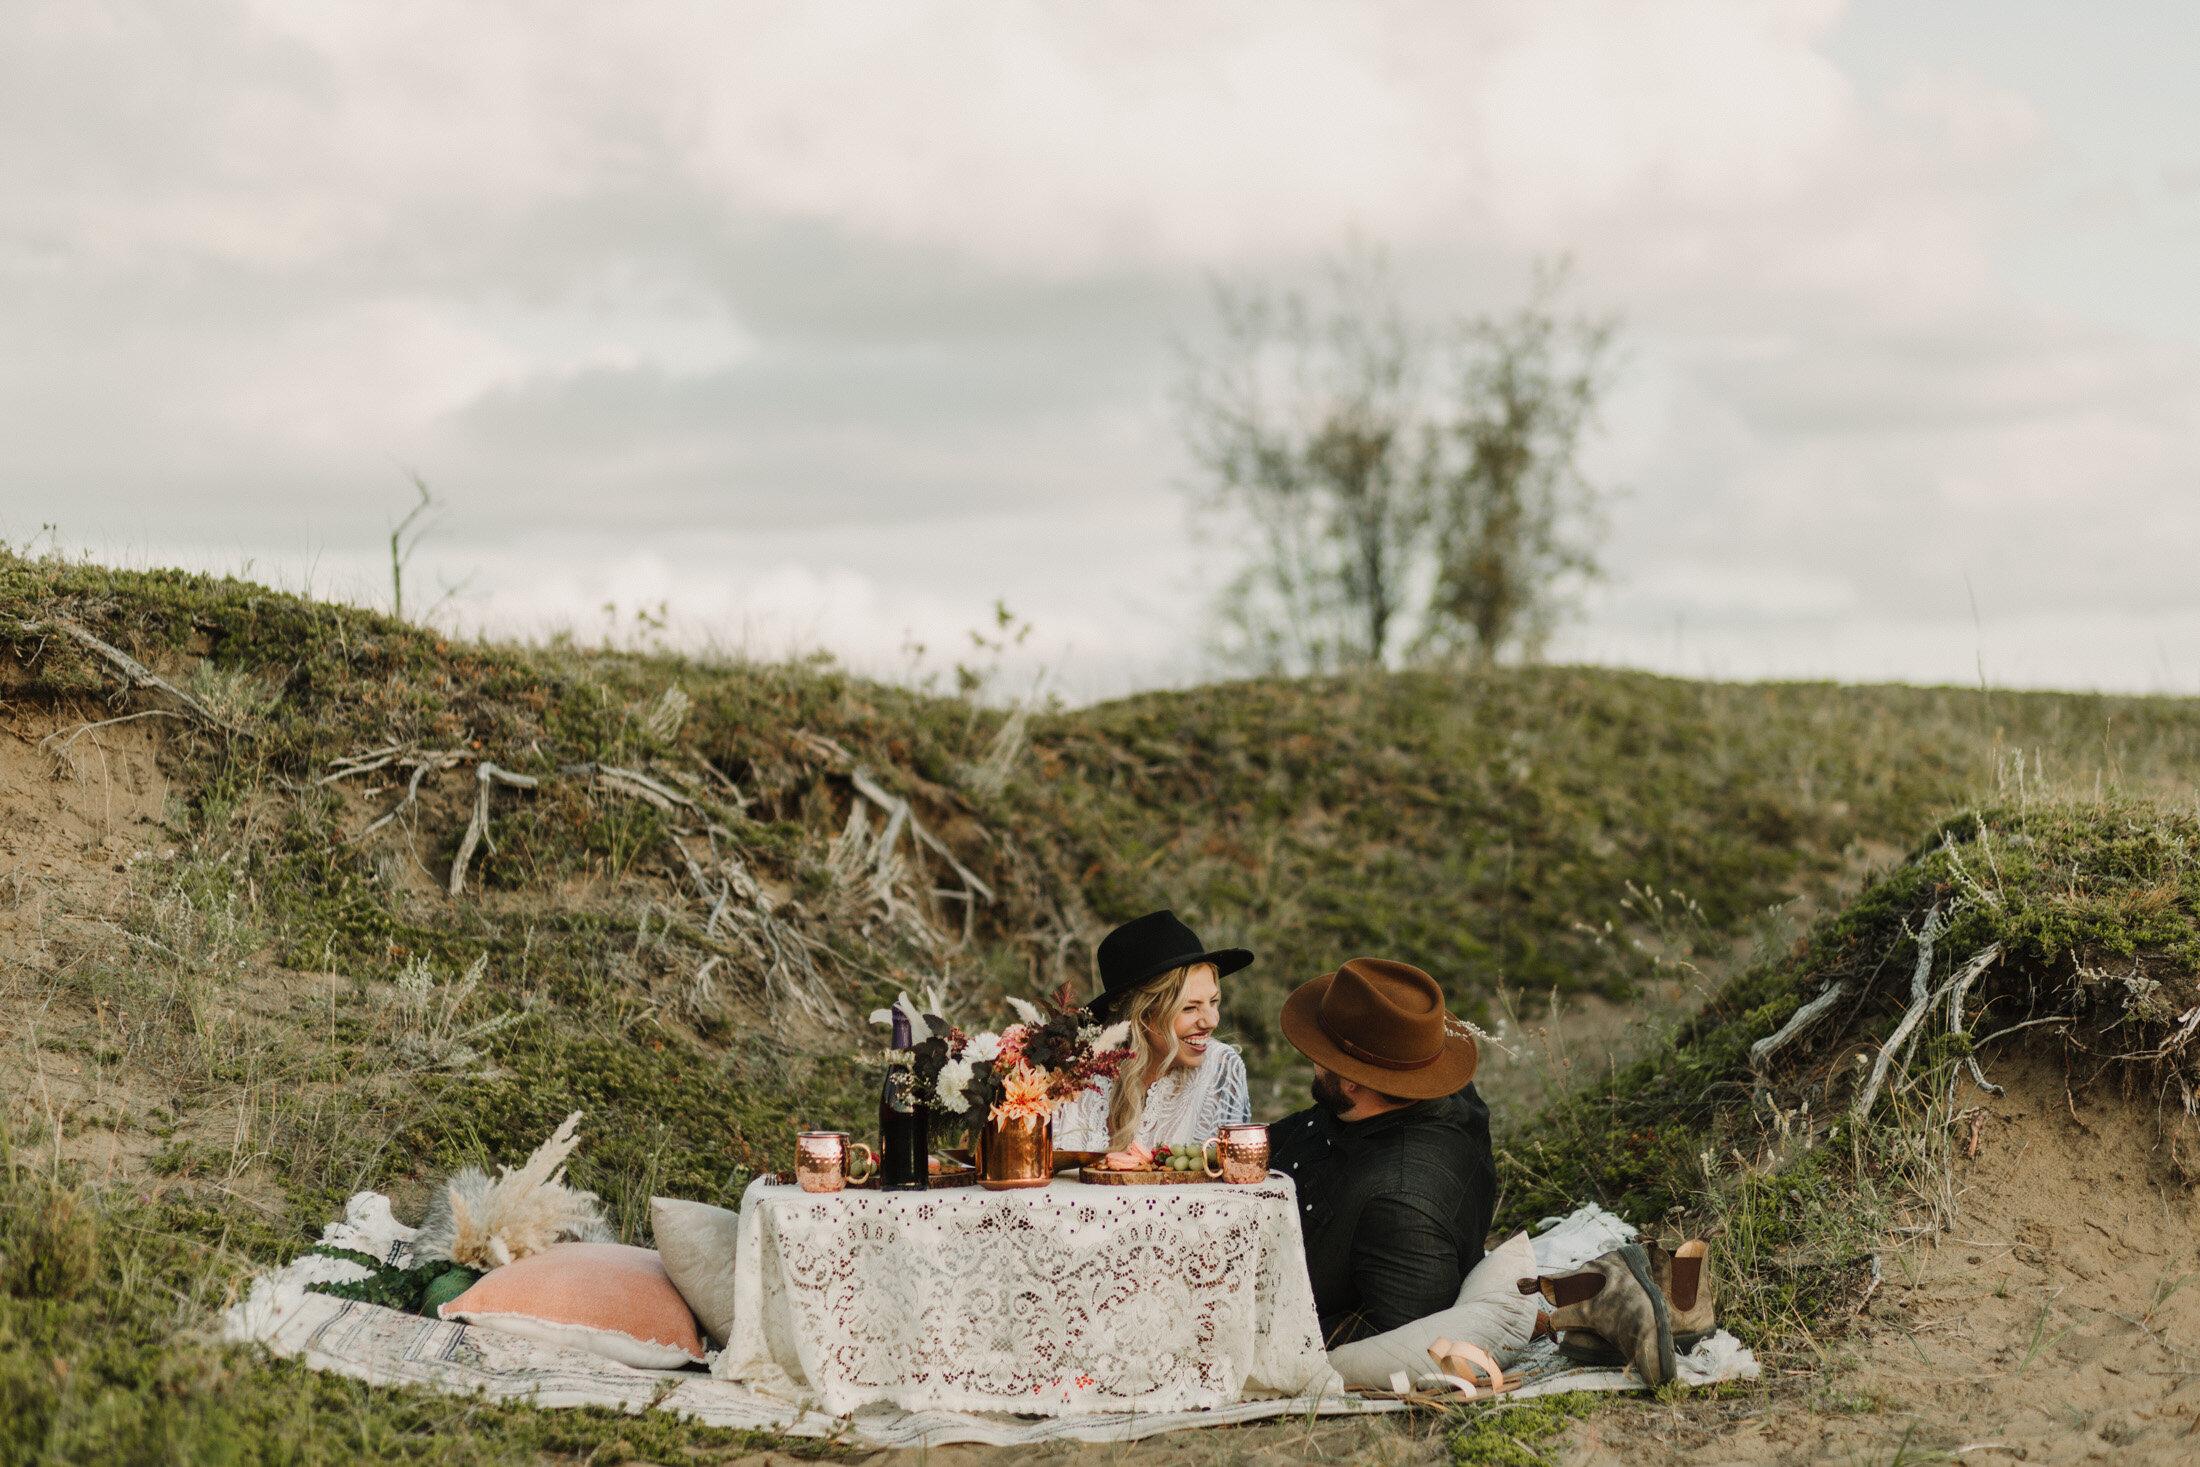 EnsoulEndearmentImagery©-SaskatoonWeddingPhotographer-StyledElopement-1807.jpg